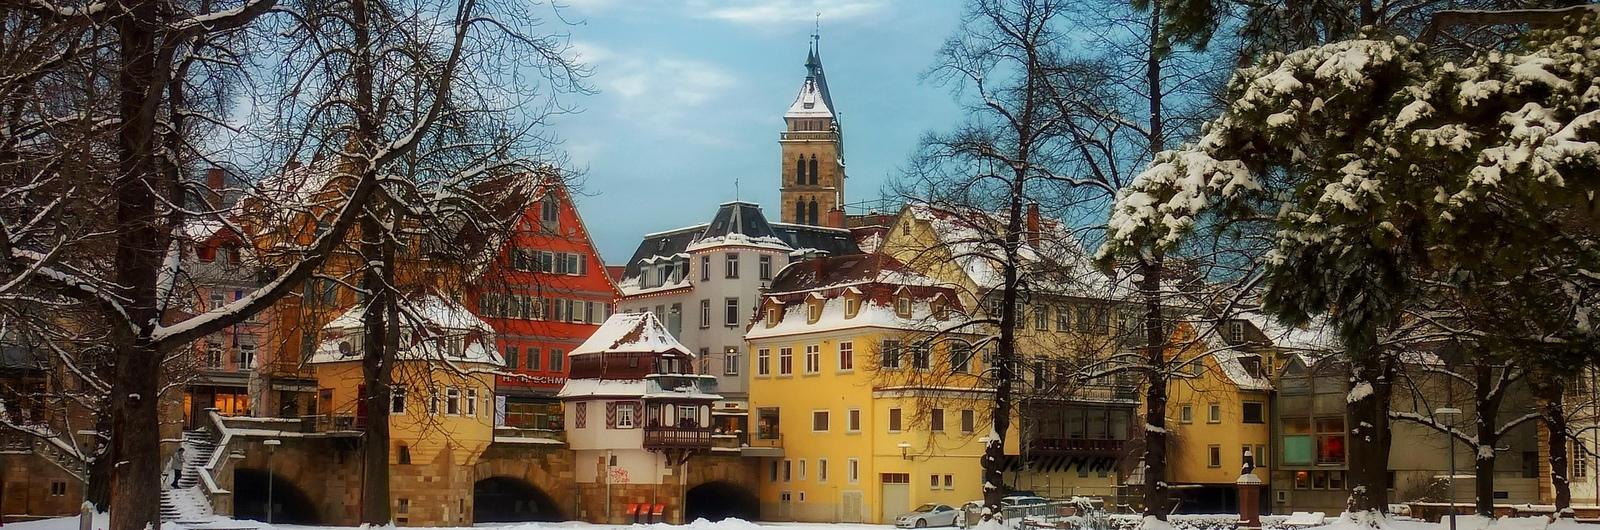 esslingen city header